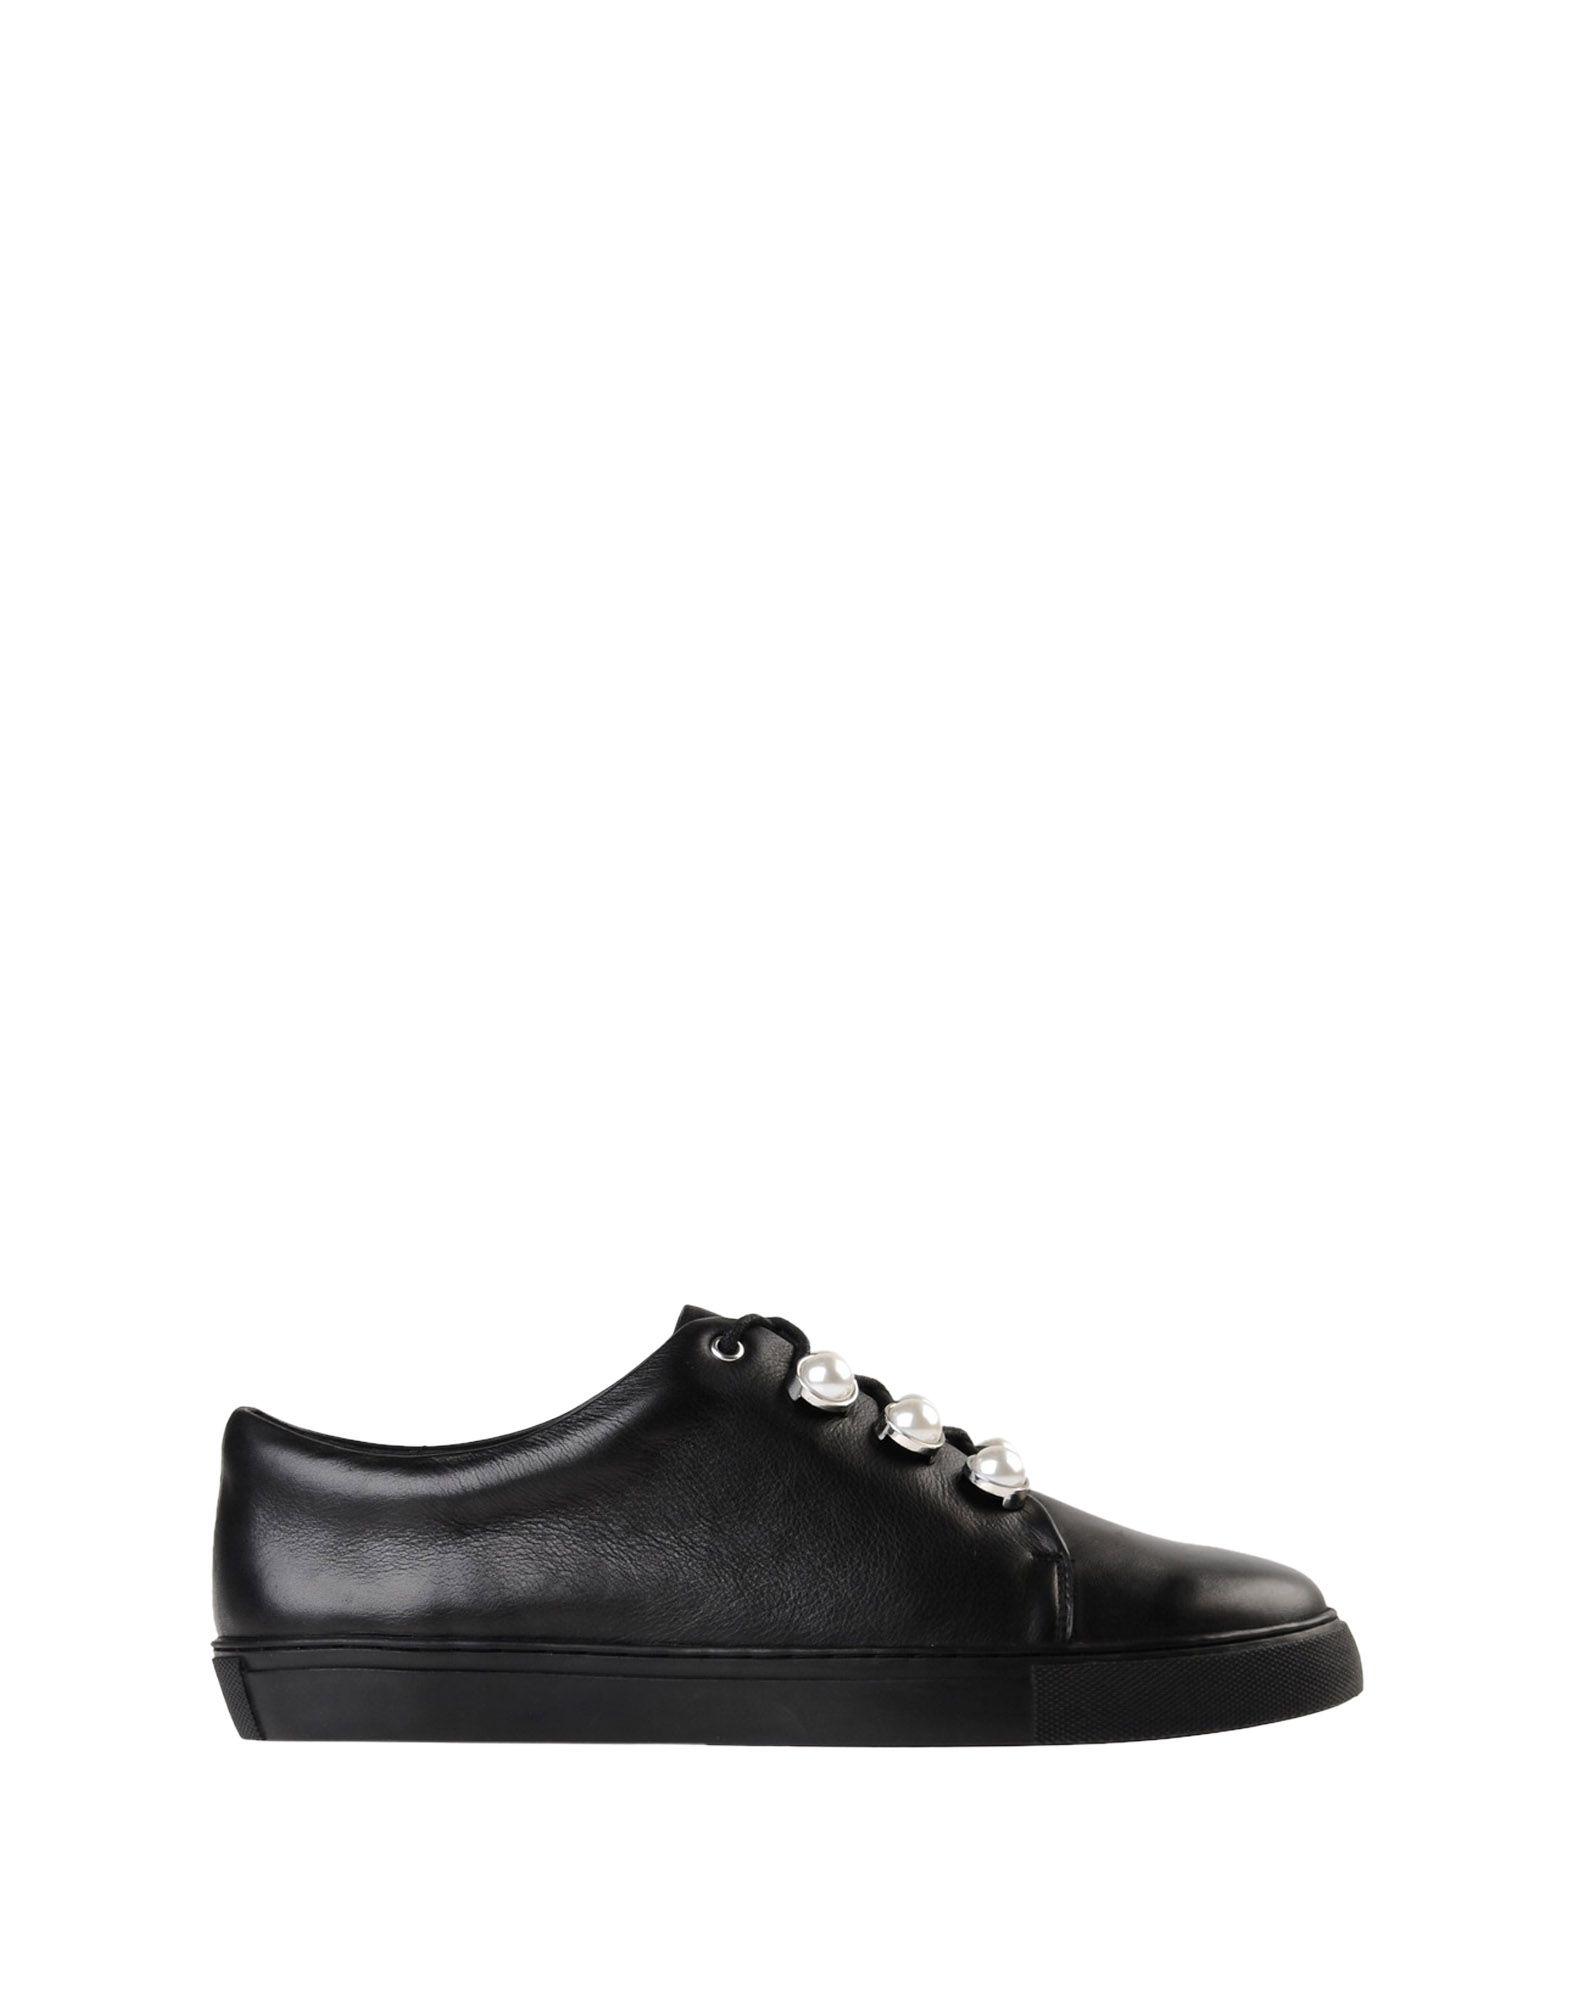 E8 By Miista Hattie  Schuhe 11468886KQ Gute Qualität beliebte Schuhe  ccd4da